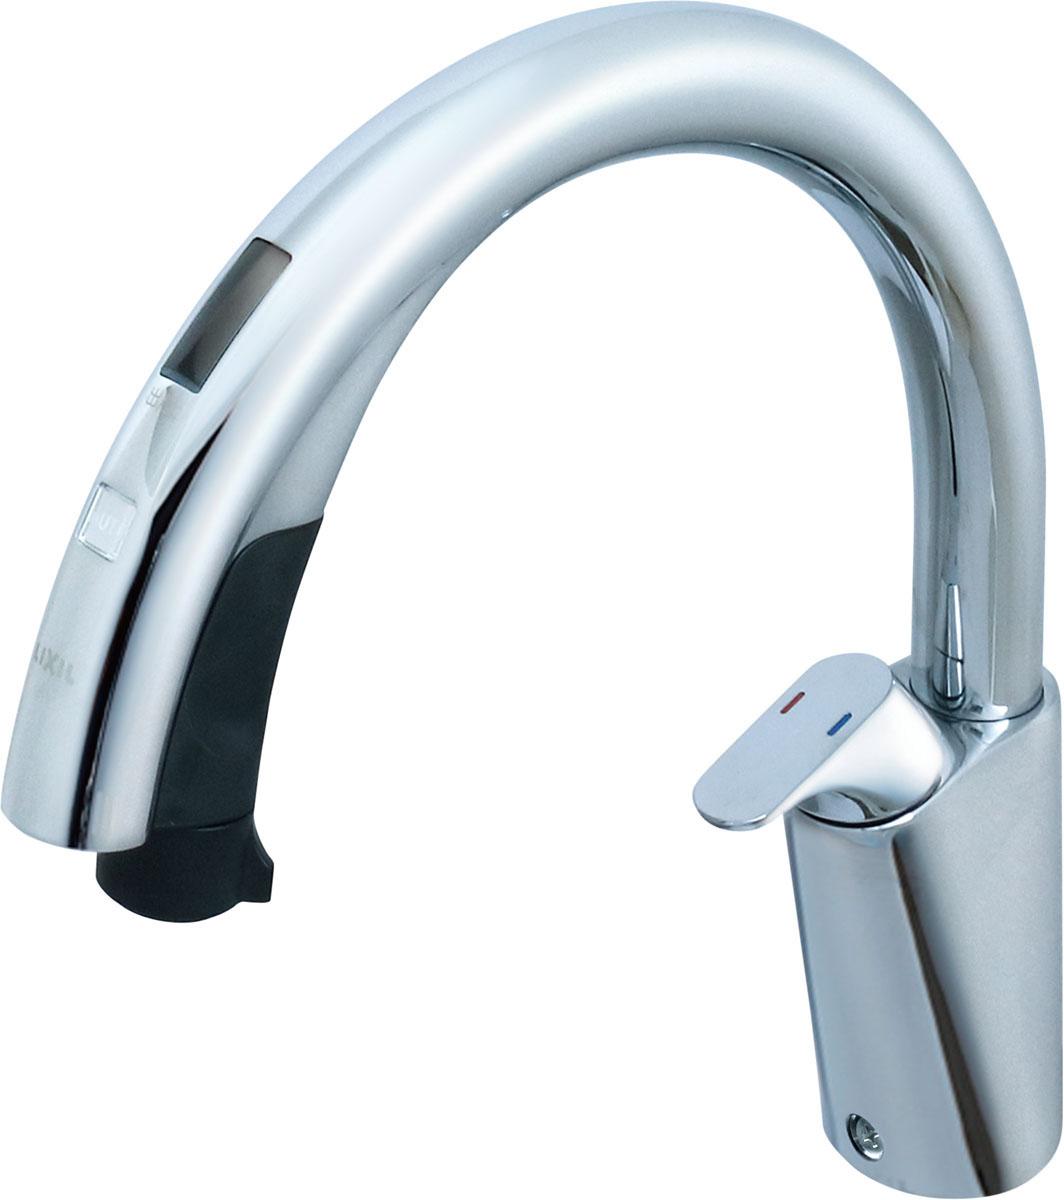 INAX LIXIL キッチン水栓 SF-NB481SX キッチン用タッチレス水栓 ナビッシュハンズフリー Bタイプ イナックス・リクシル